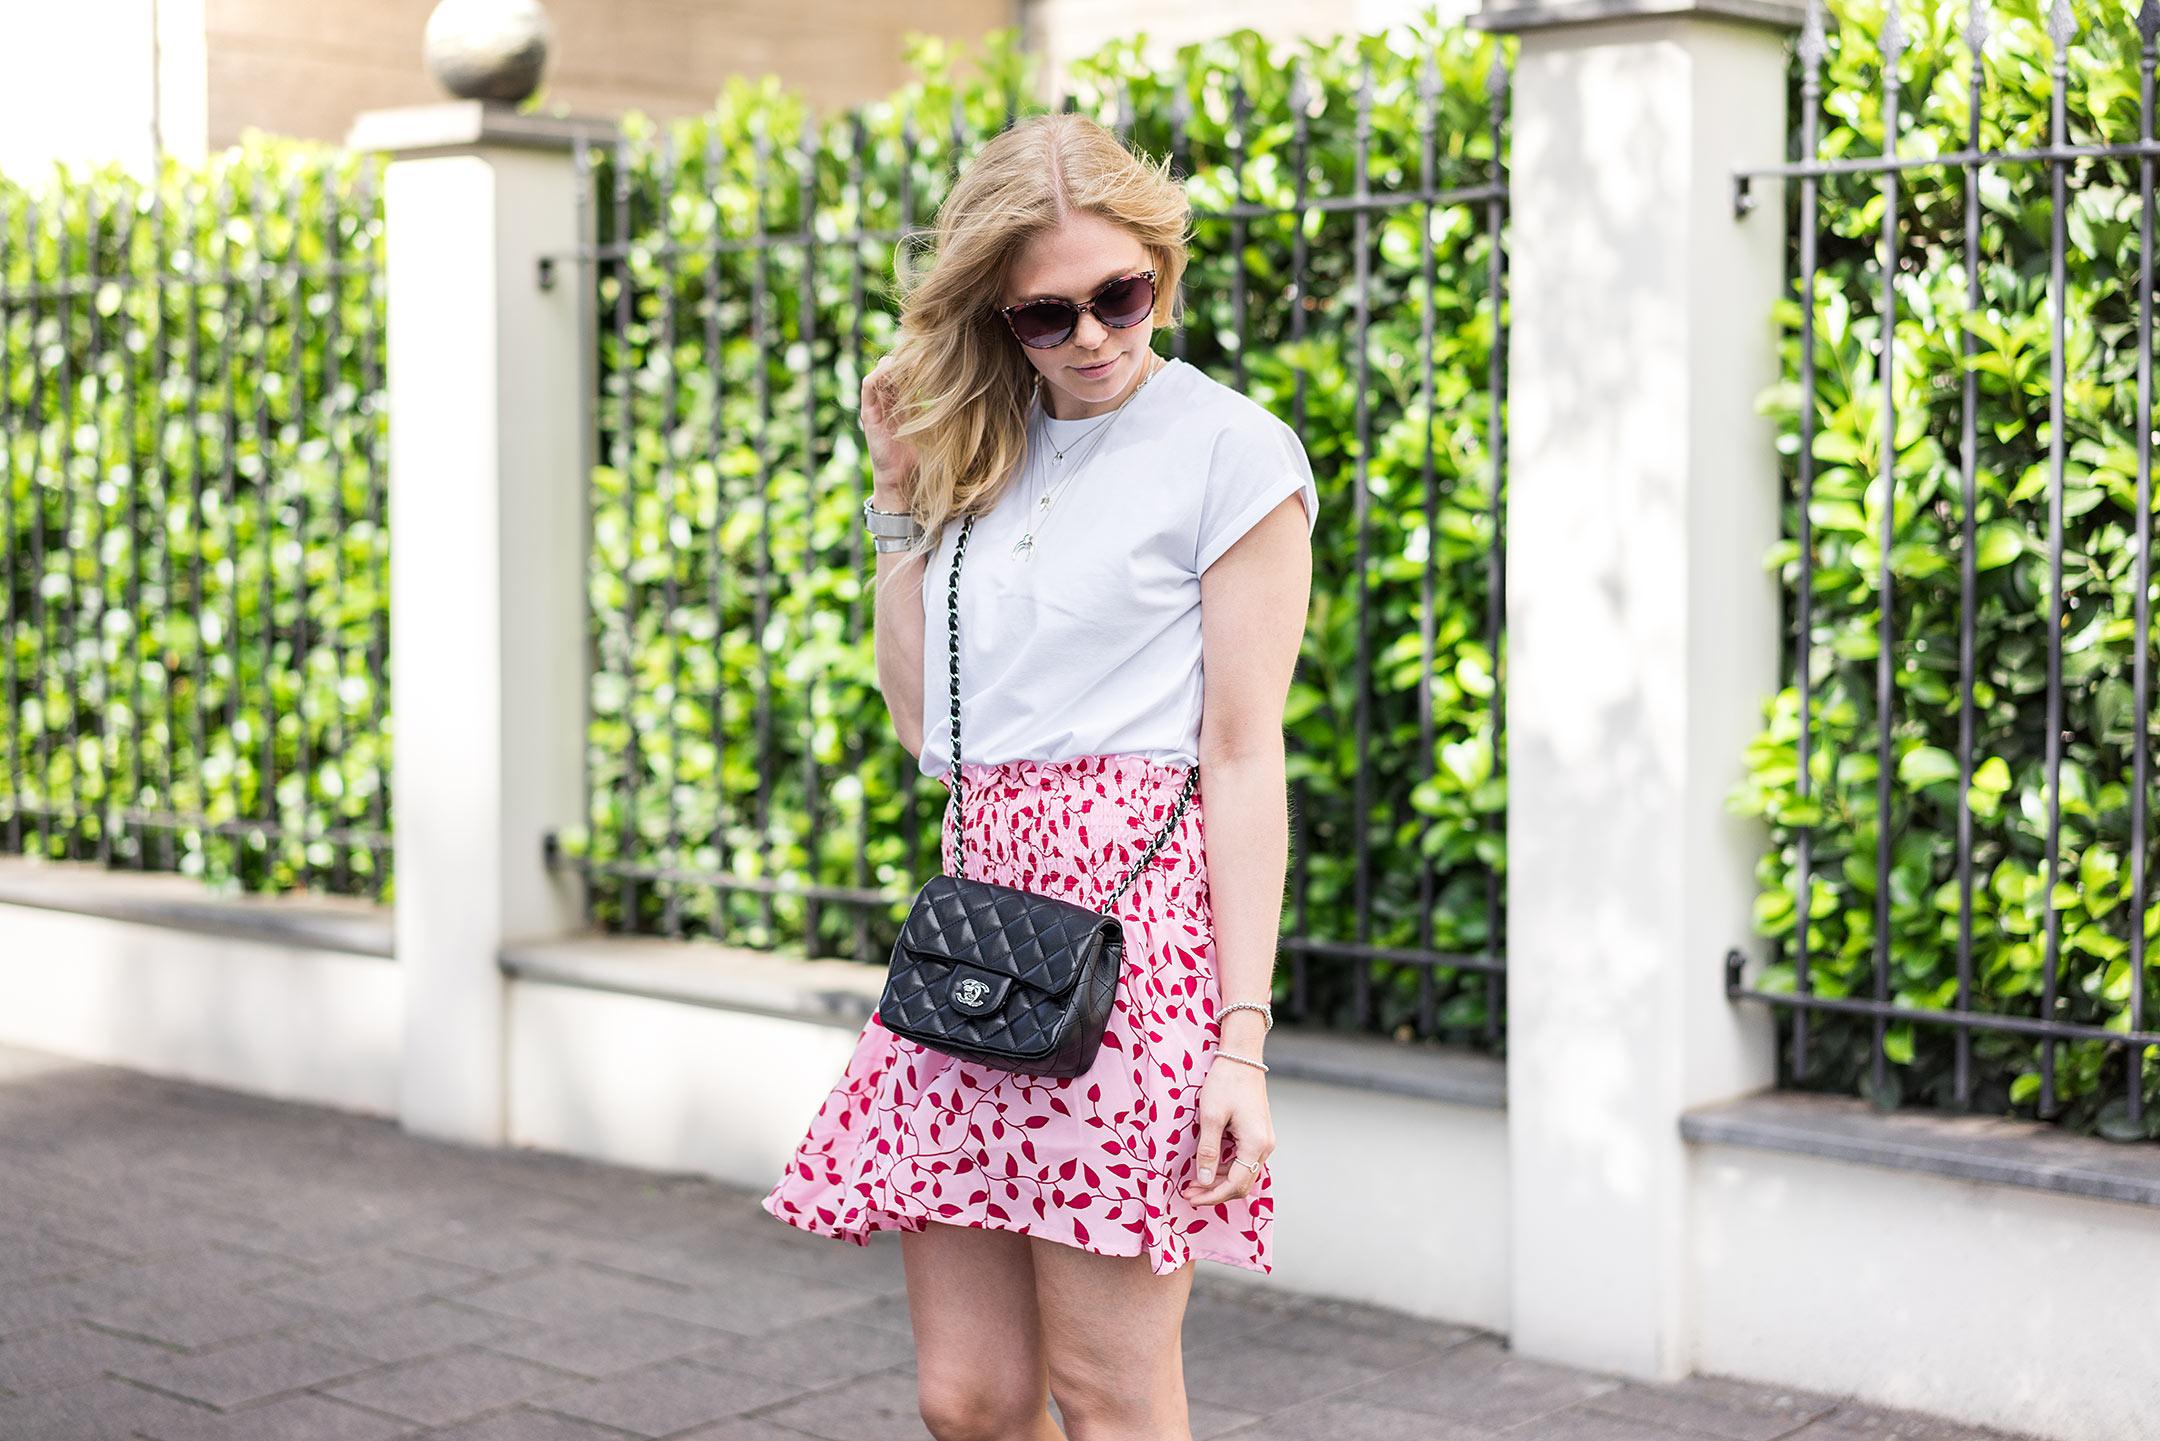 NAKD Outfit Summer Colors rot und pink Sunnyinga Fashionblog Düsseldorf